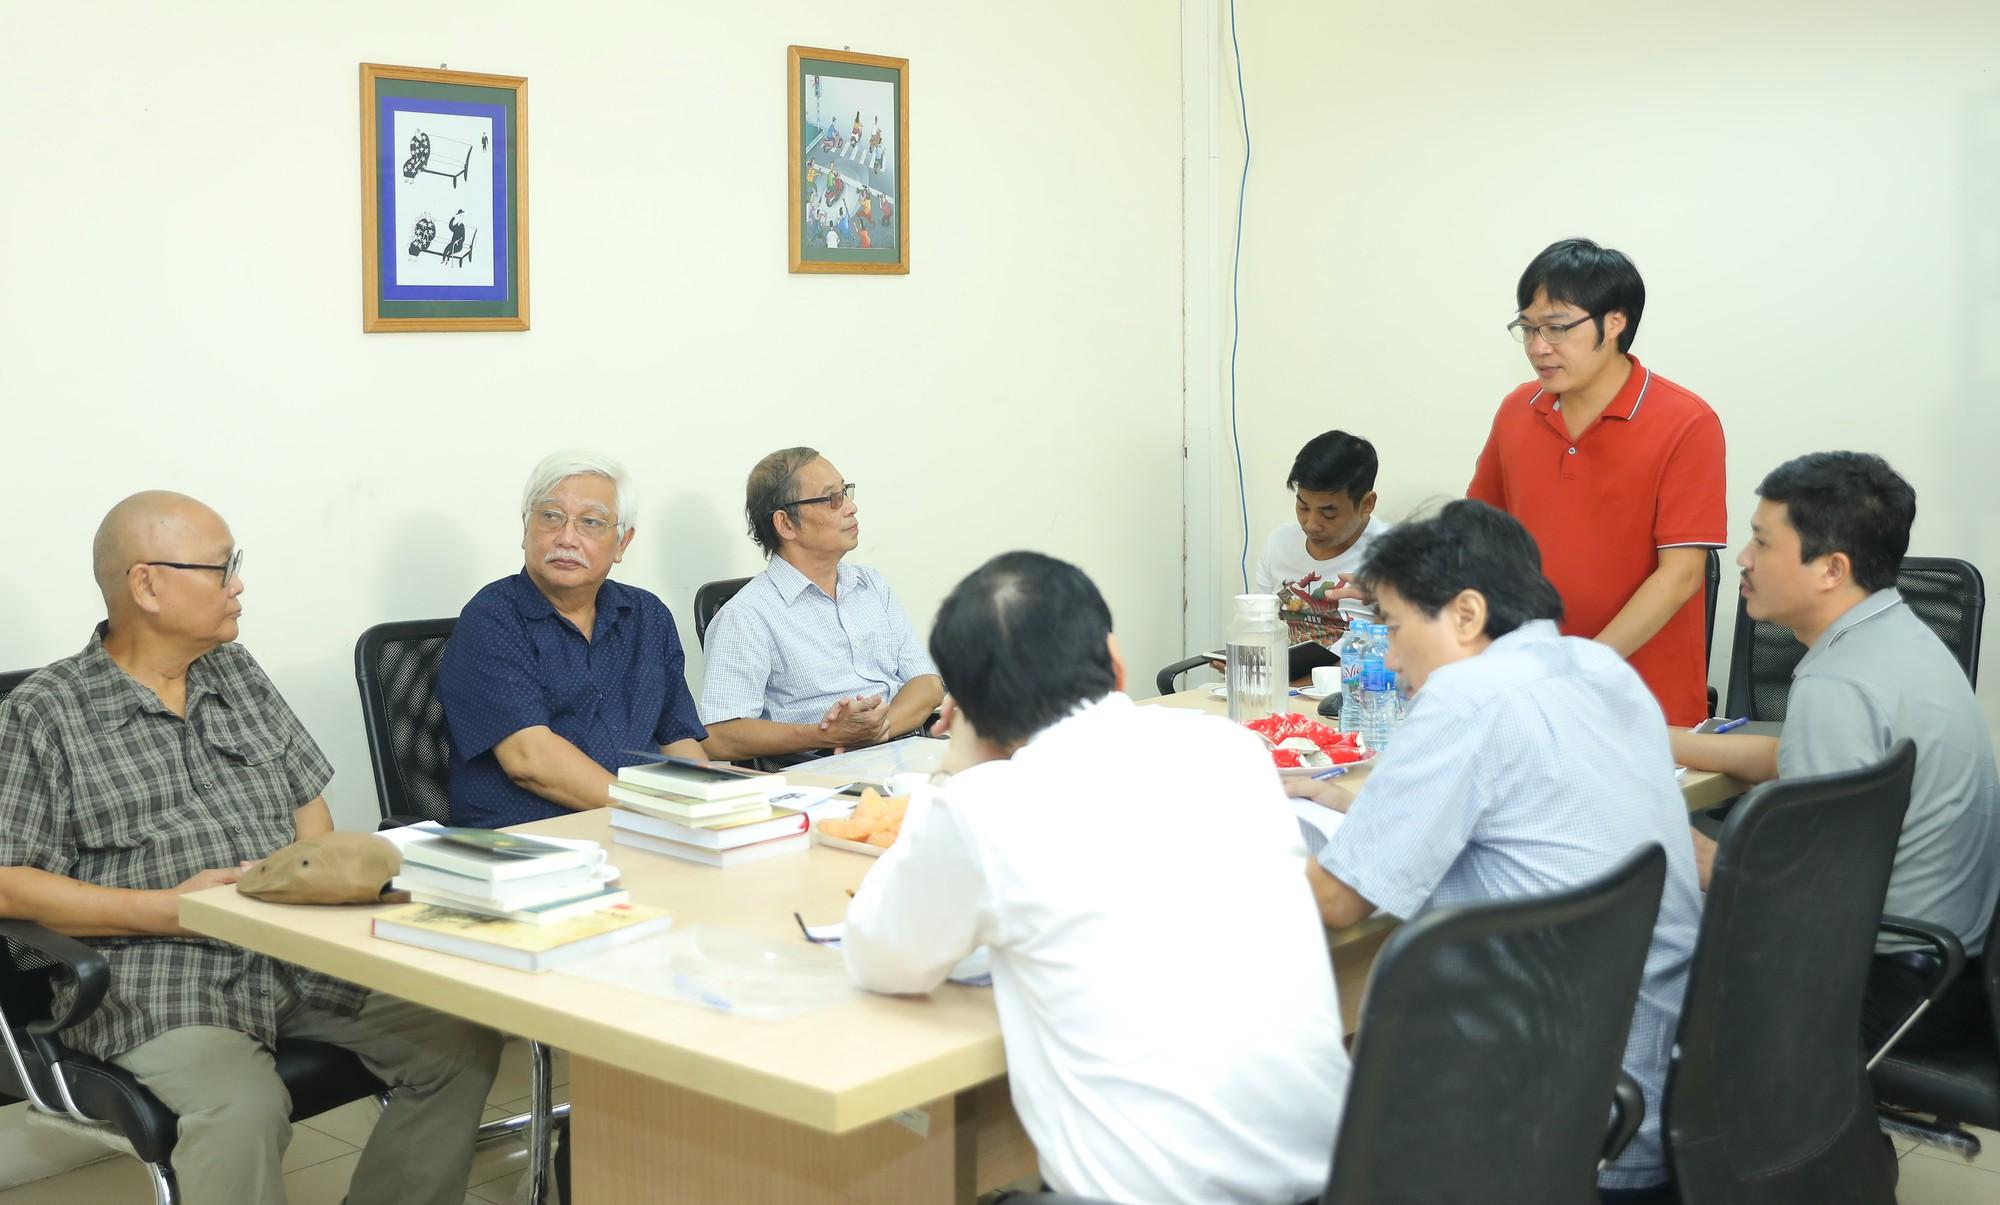 Hoi dong Giam khao lam viec (phien thu nhat)